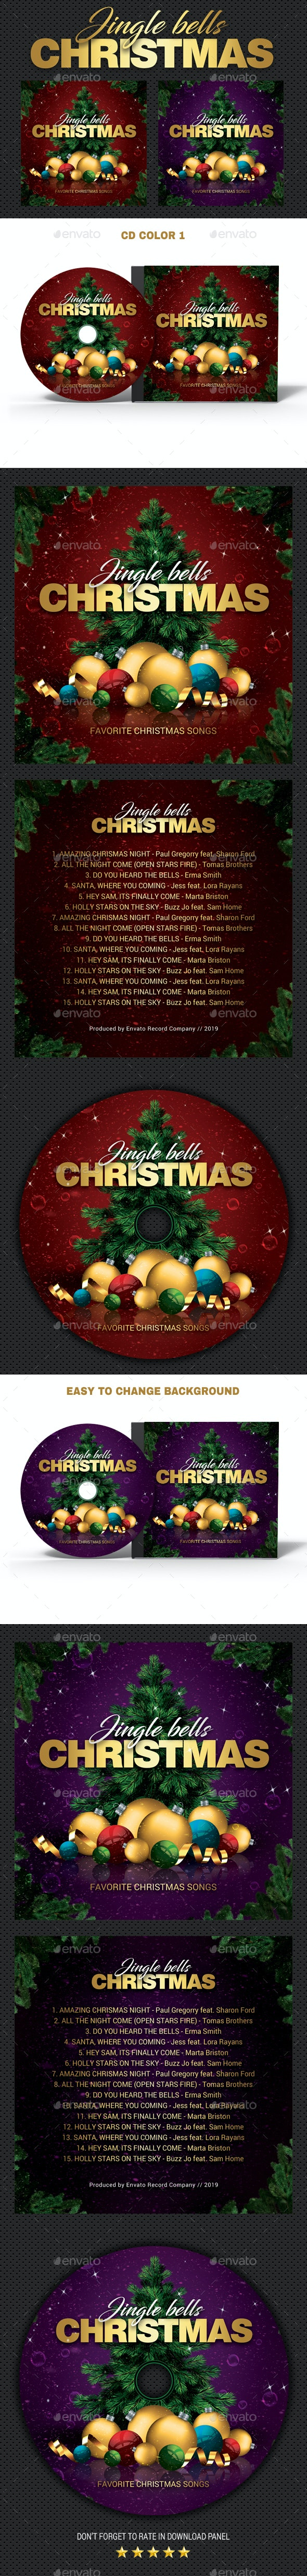 Christmas Bells CD Cover v2 - CD & DVD Artwork Print Templates